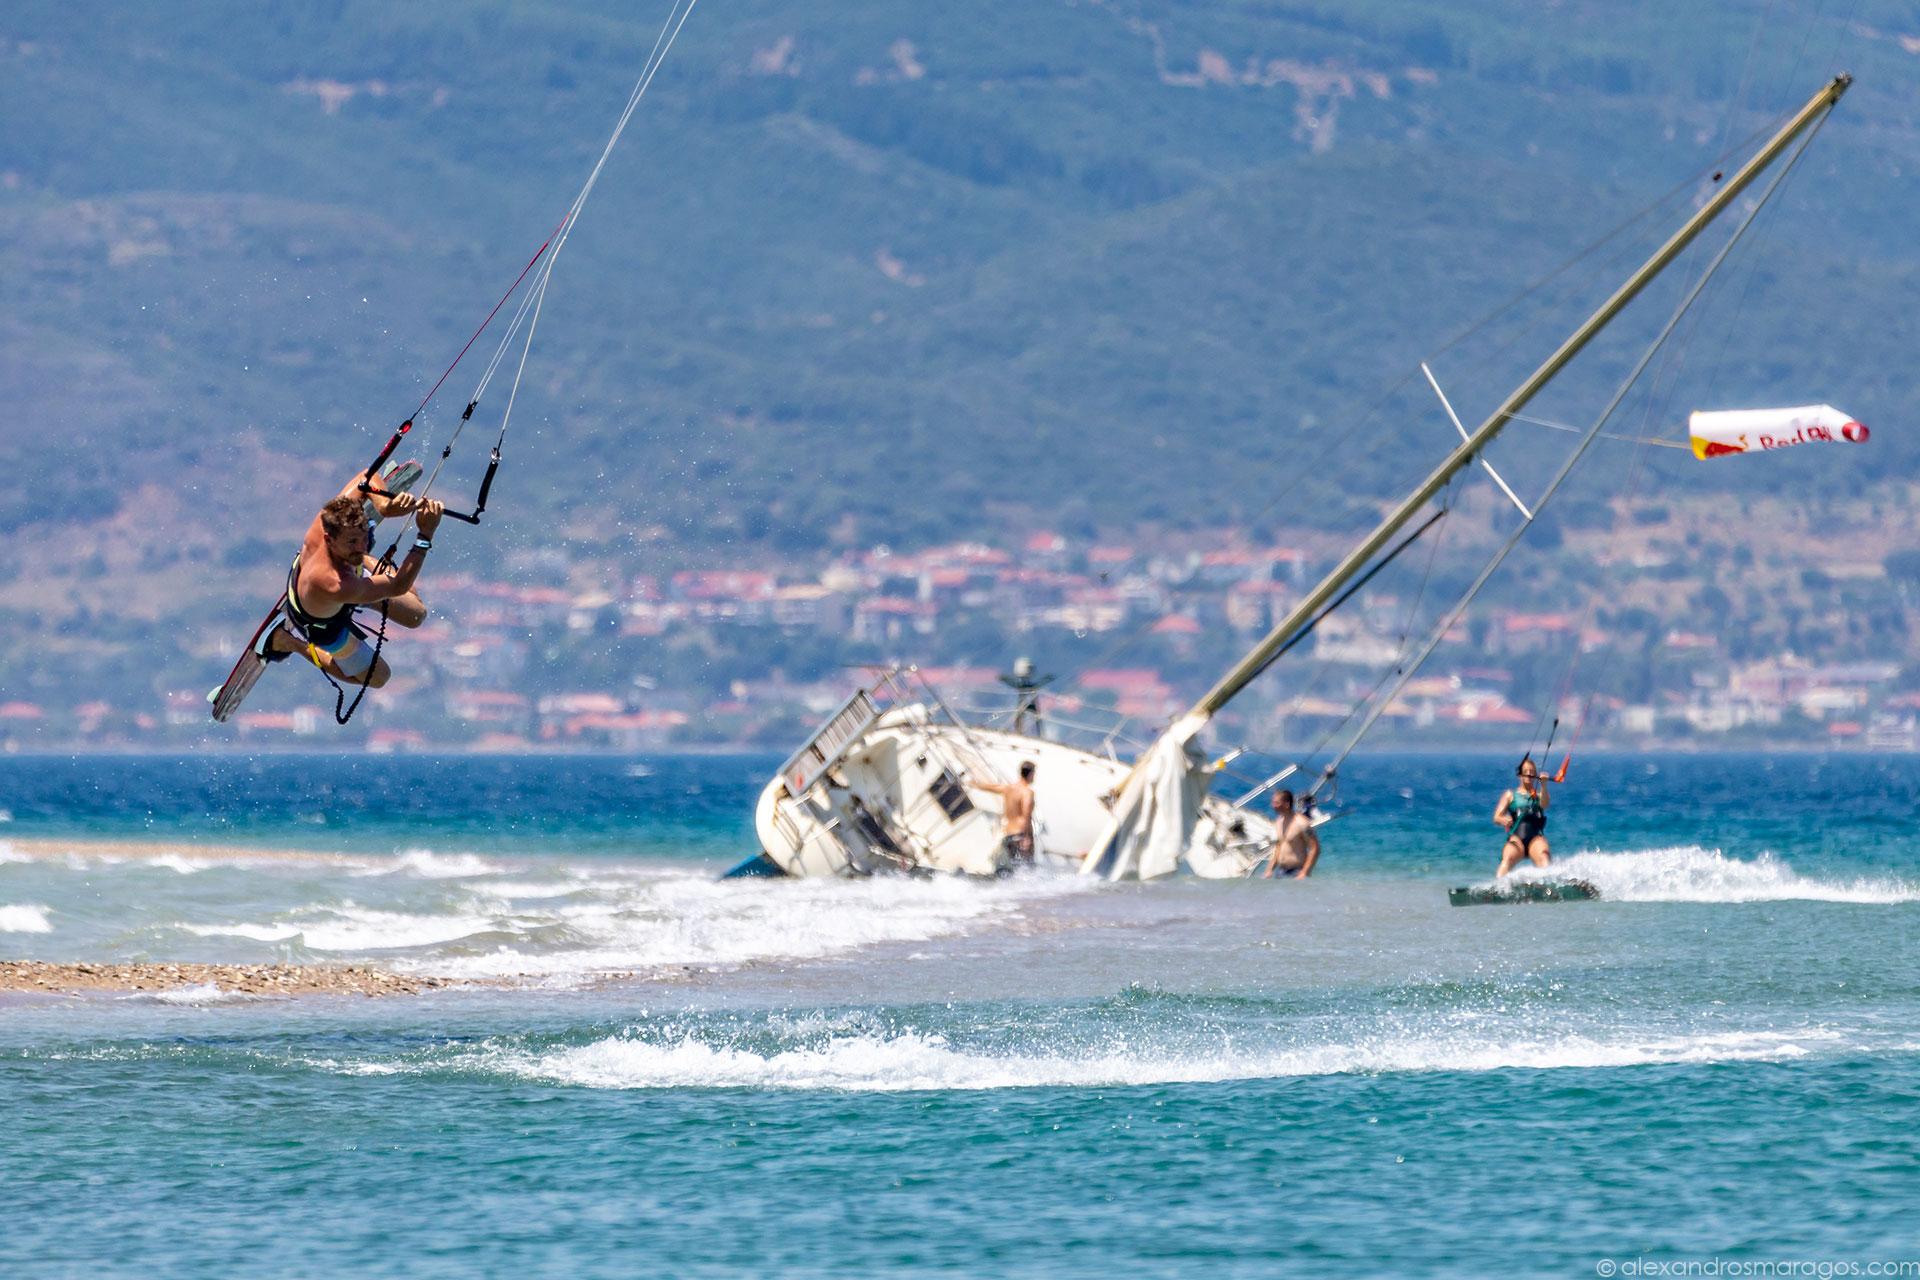 Kitesurf Festival, Cape Drepano, Greece |© Alexandros Maragos